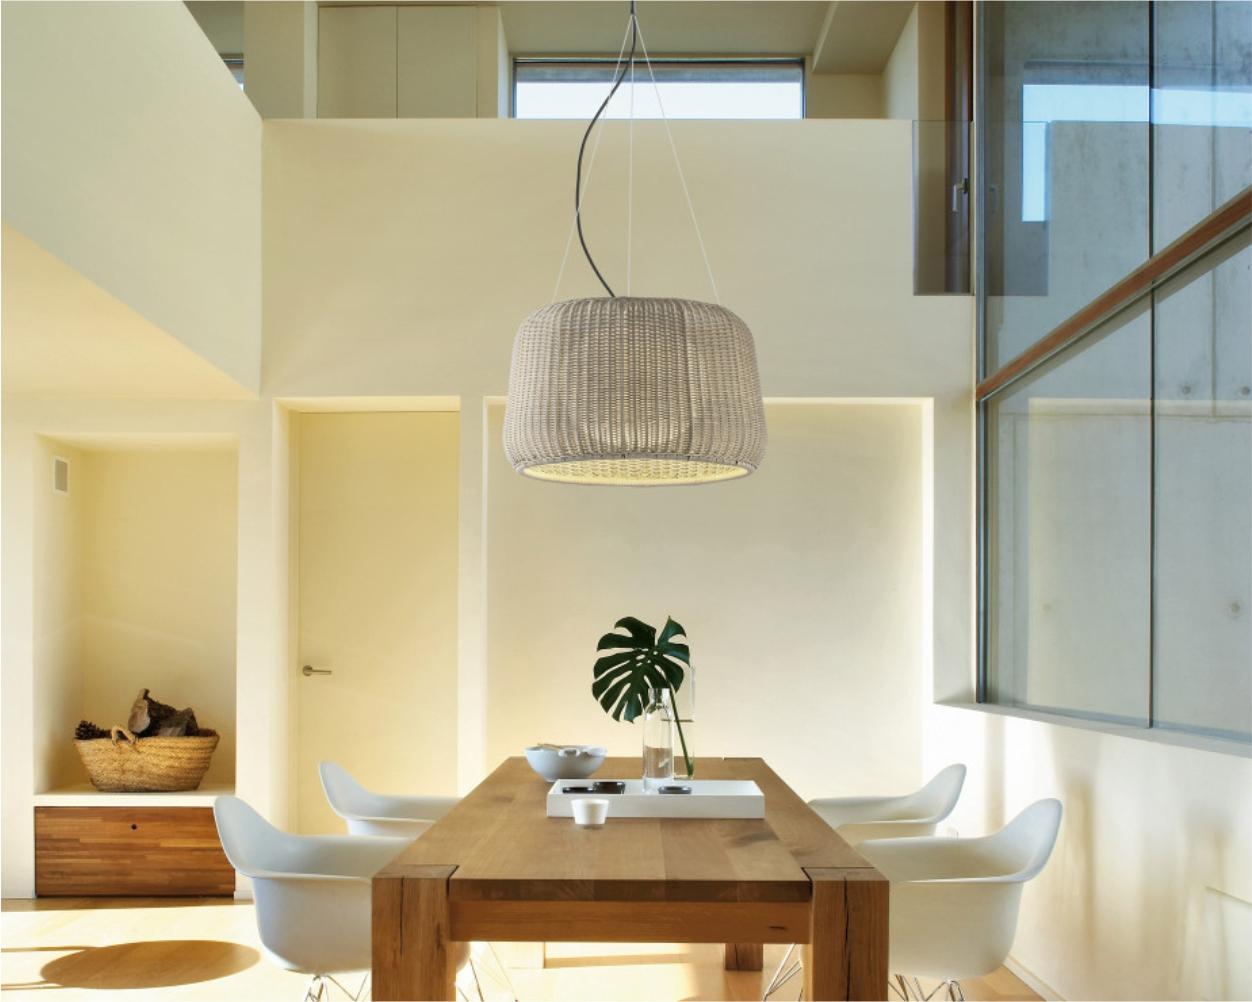 Pendul - lampi suspendate de interior, modele